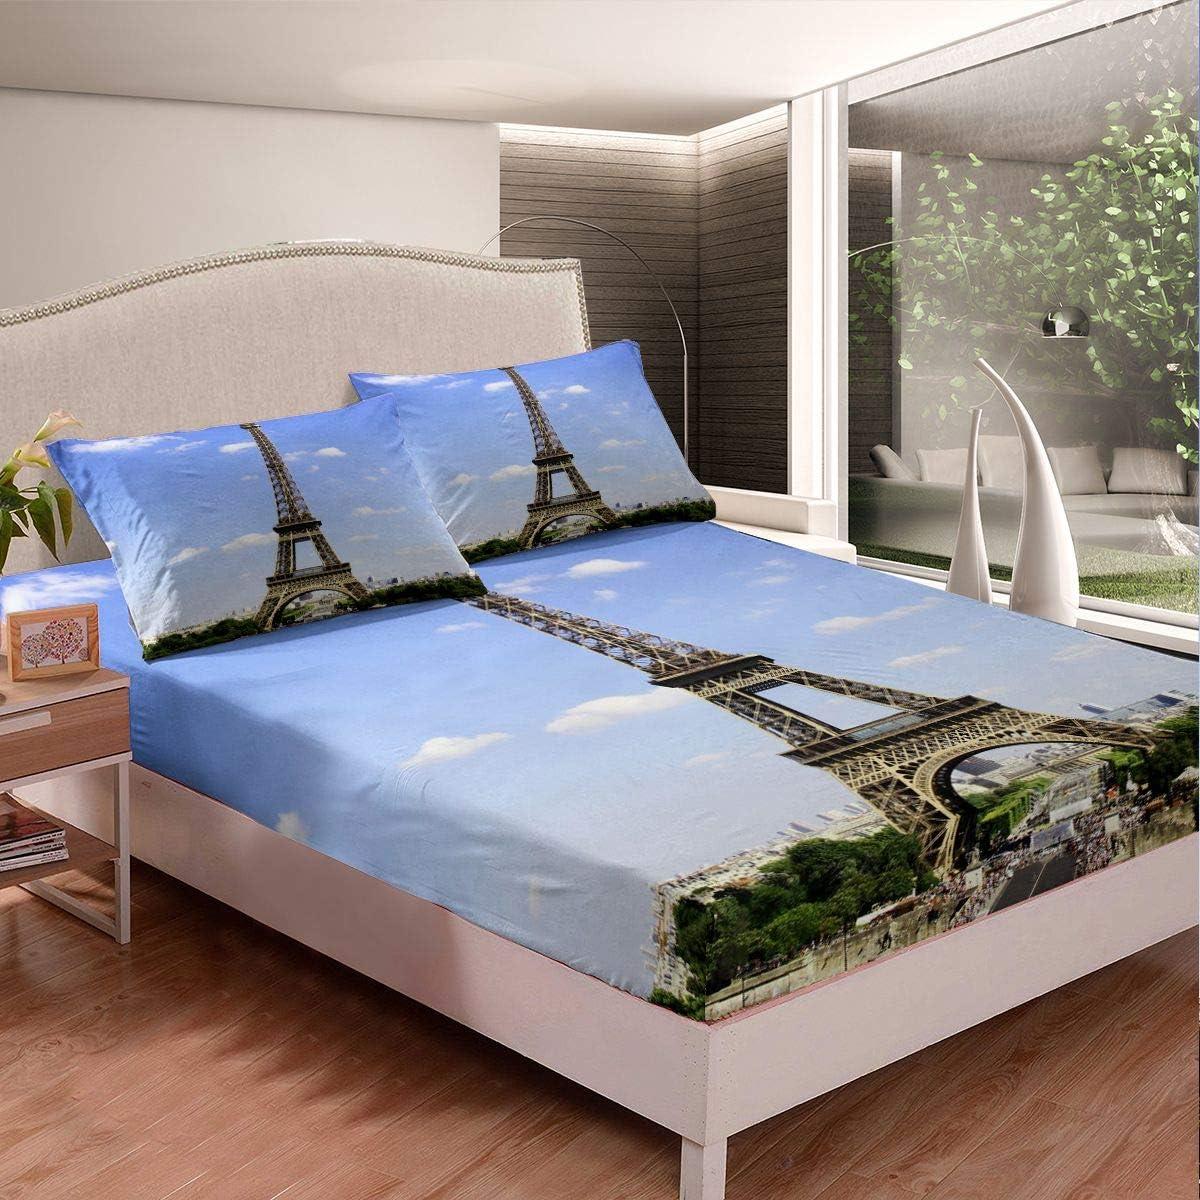 Superior Eiffel Tower Bed Sheet Set Chic Theme F Ranking TOP11 Bedding Paris Modern